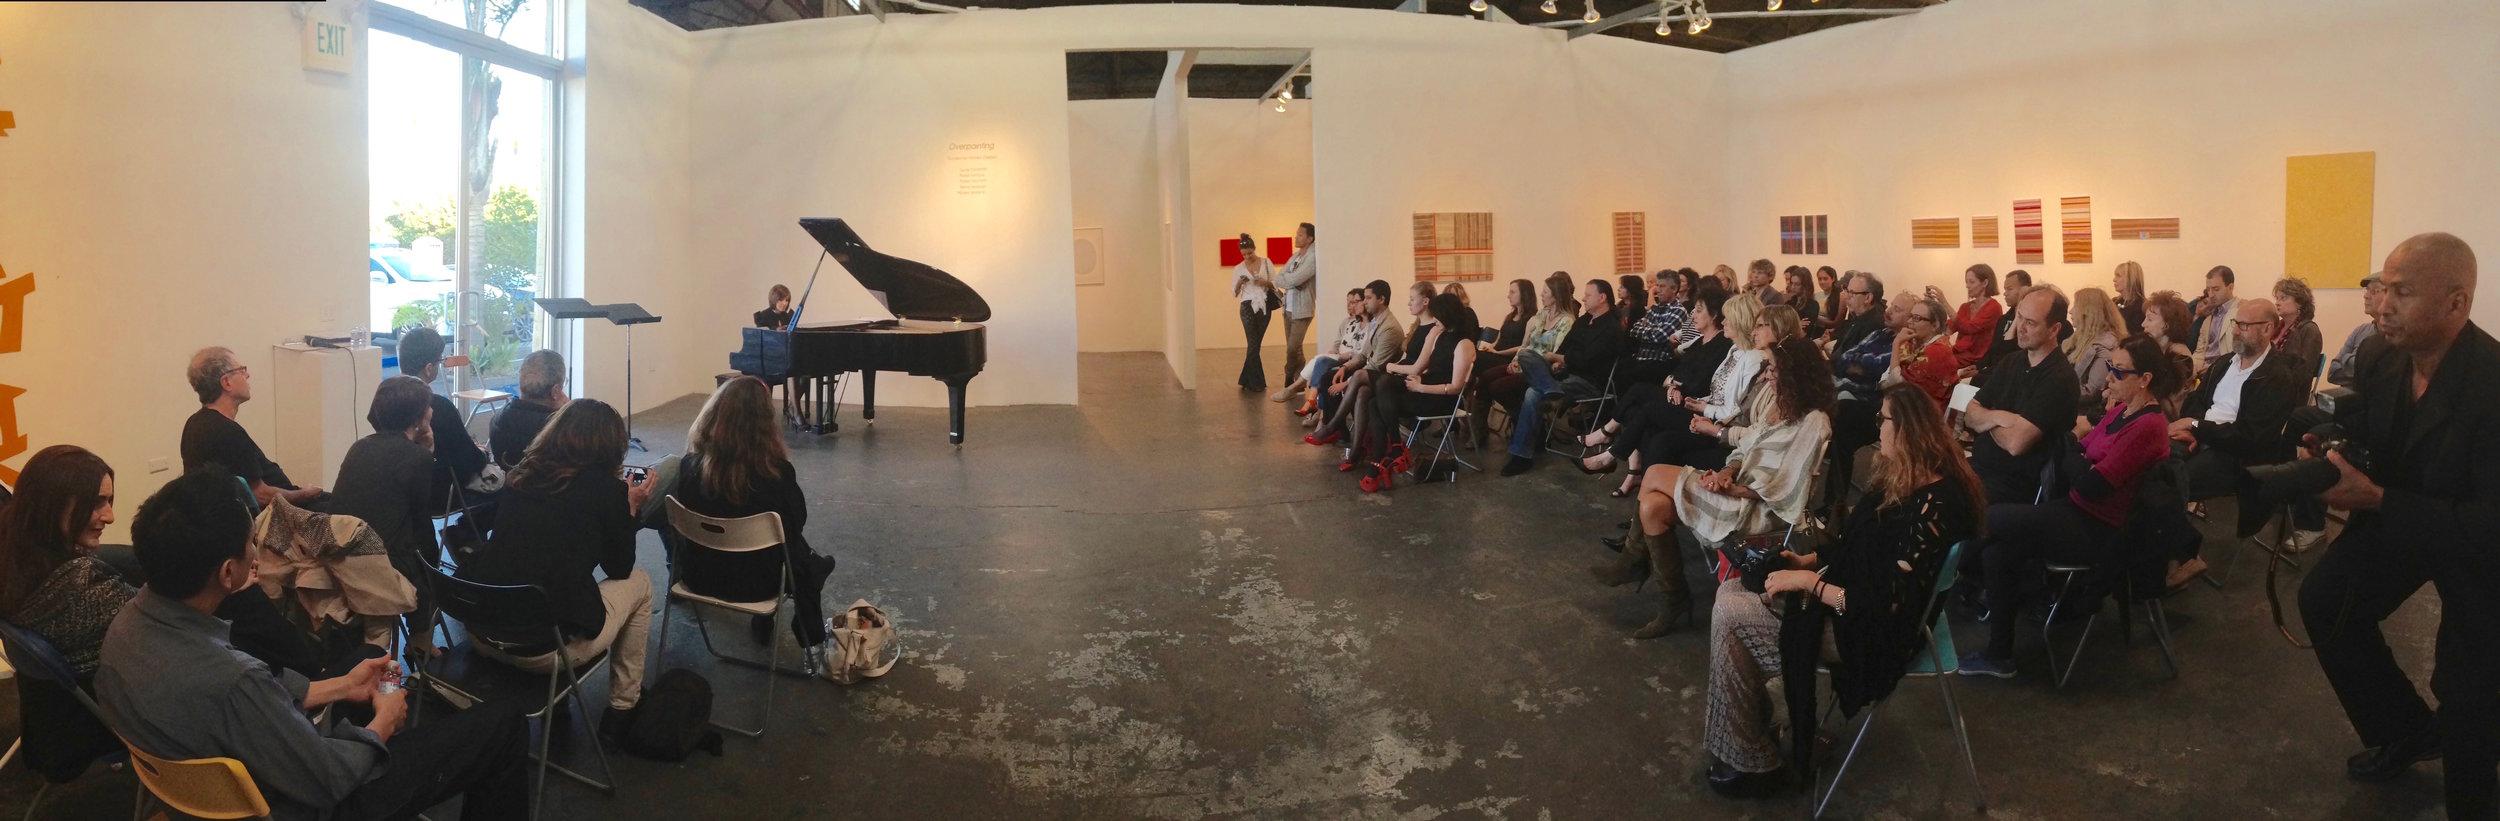 15.2 Italian pianist.jpg